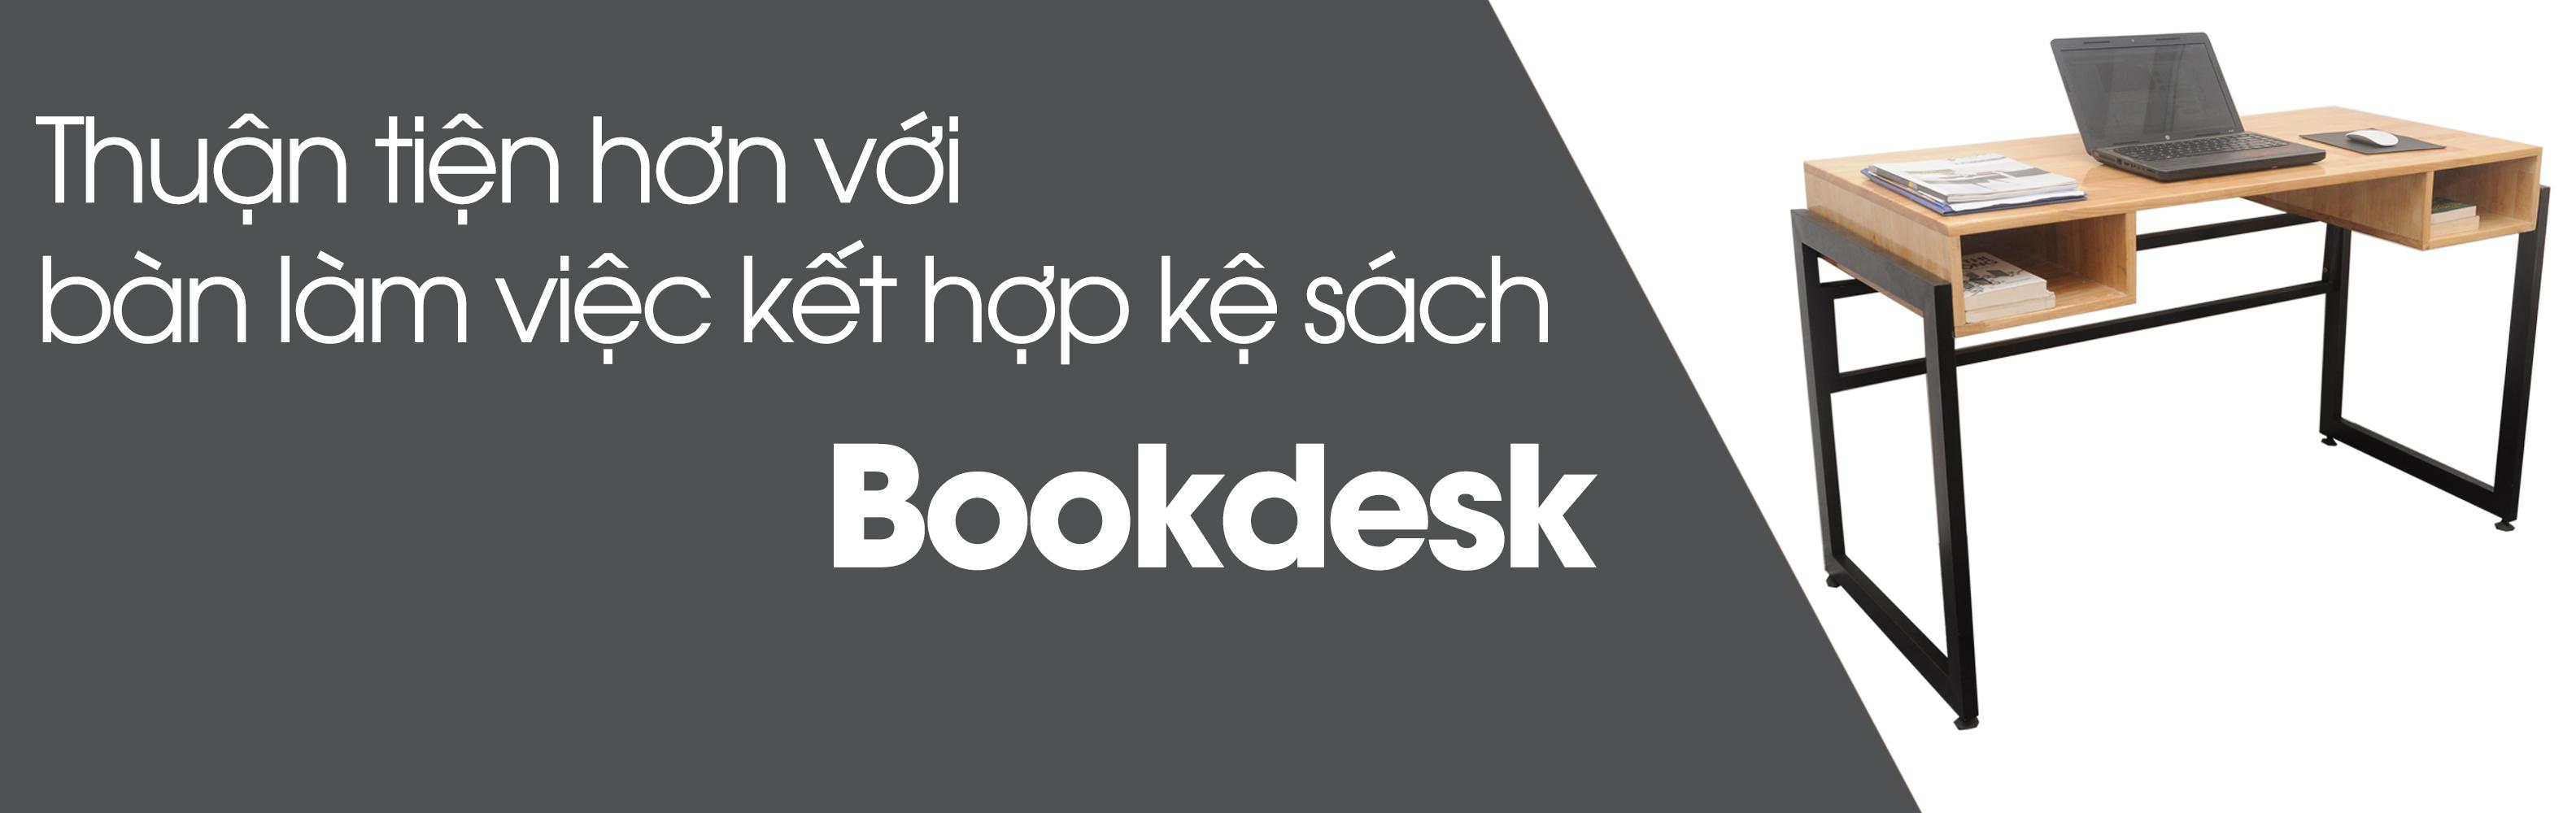 bookdesk